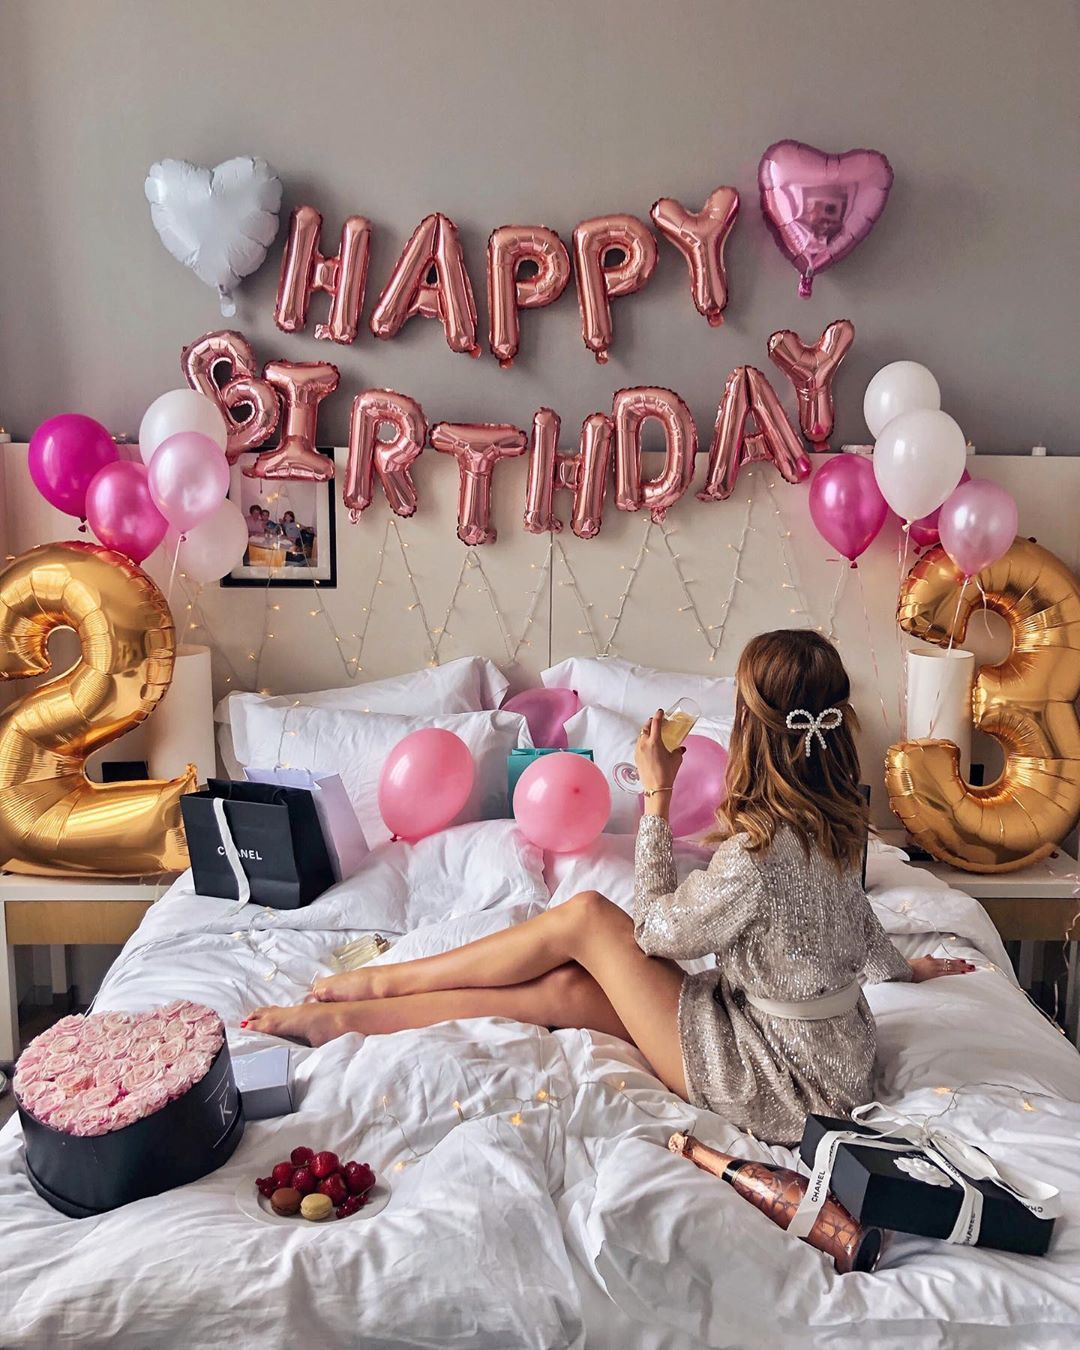 Birthday Girl Celebrated My 23rd Birthday At Sofitelhamburgalterwall Decoracion Cumpleanos Mujer Adulta Decoracion Cumpleanos Mujer Diseno De Cumpleanos